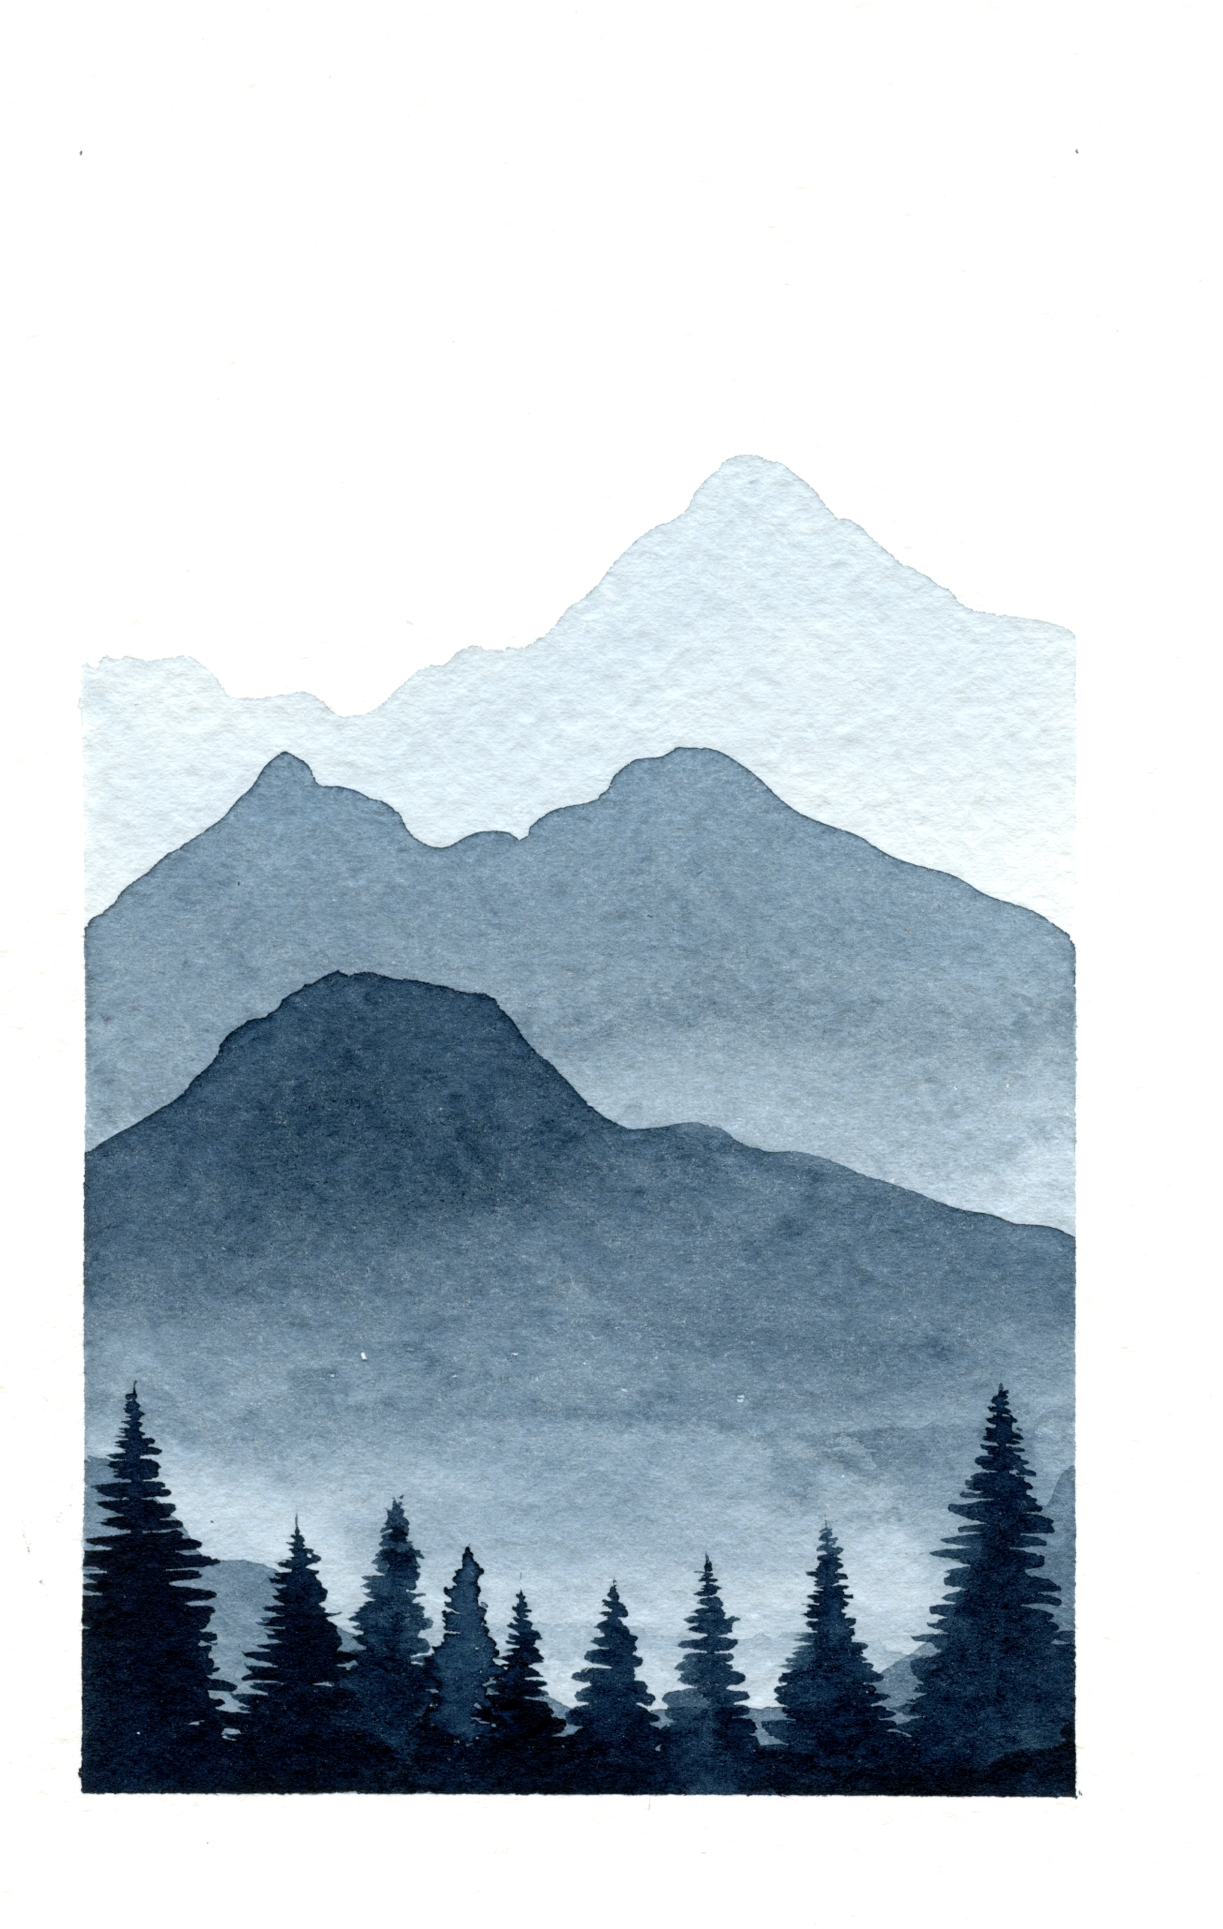 watercolor006.jpg